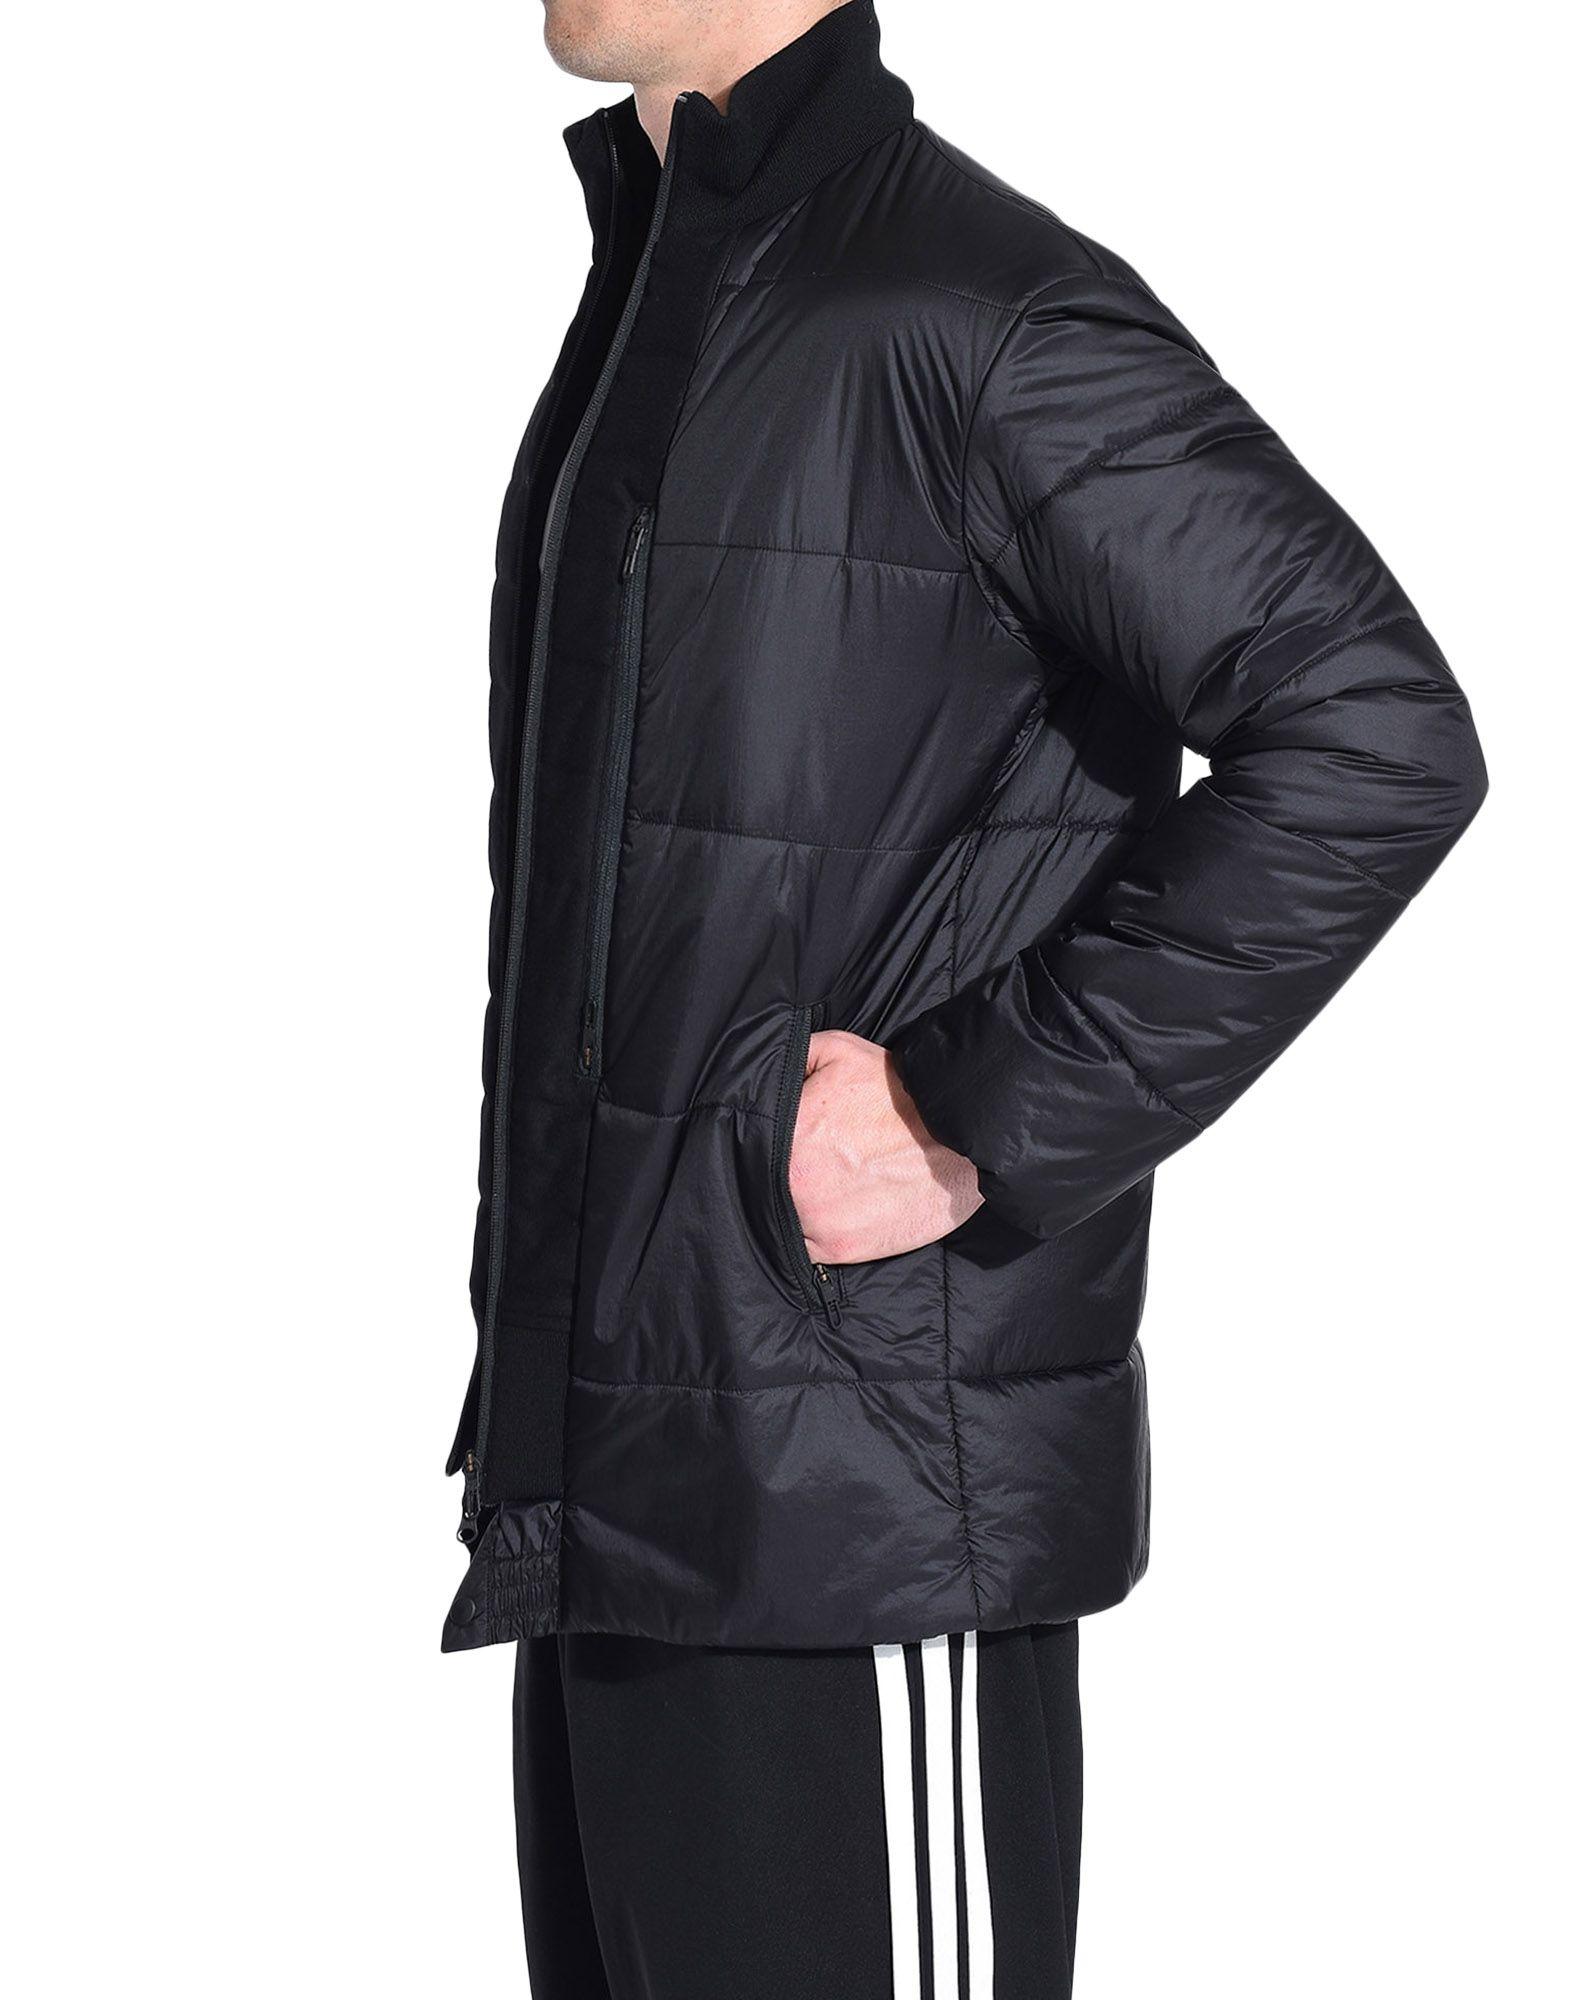 Y-3 Y-3 Patchwork Down Jacket Down jacket Man e